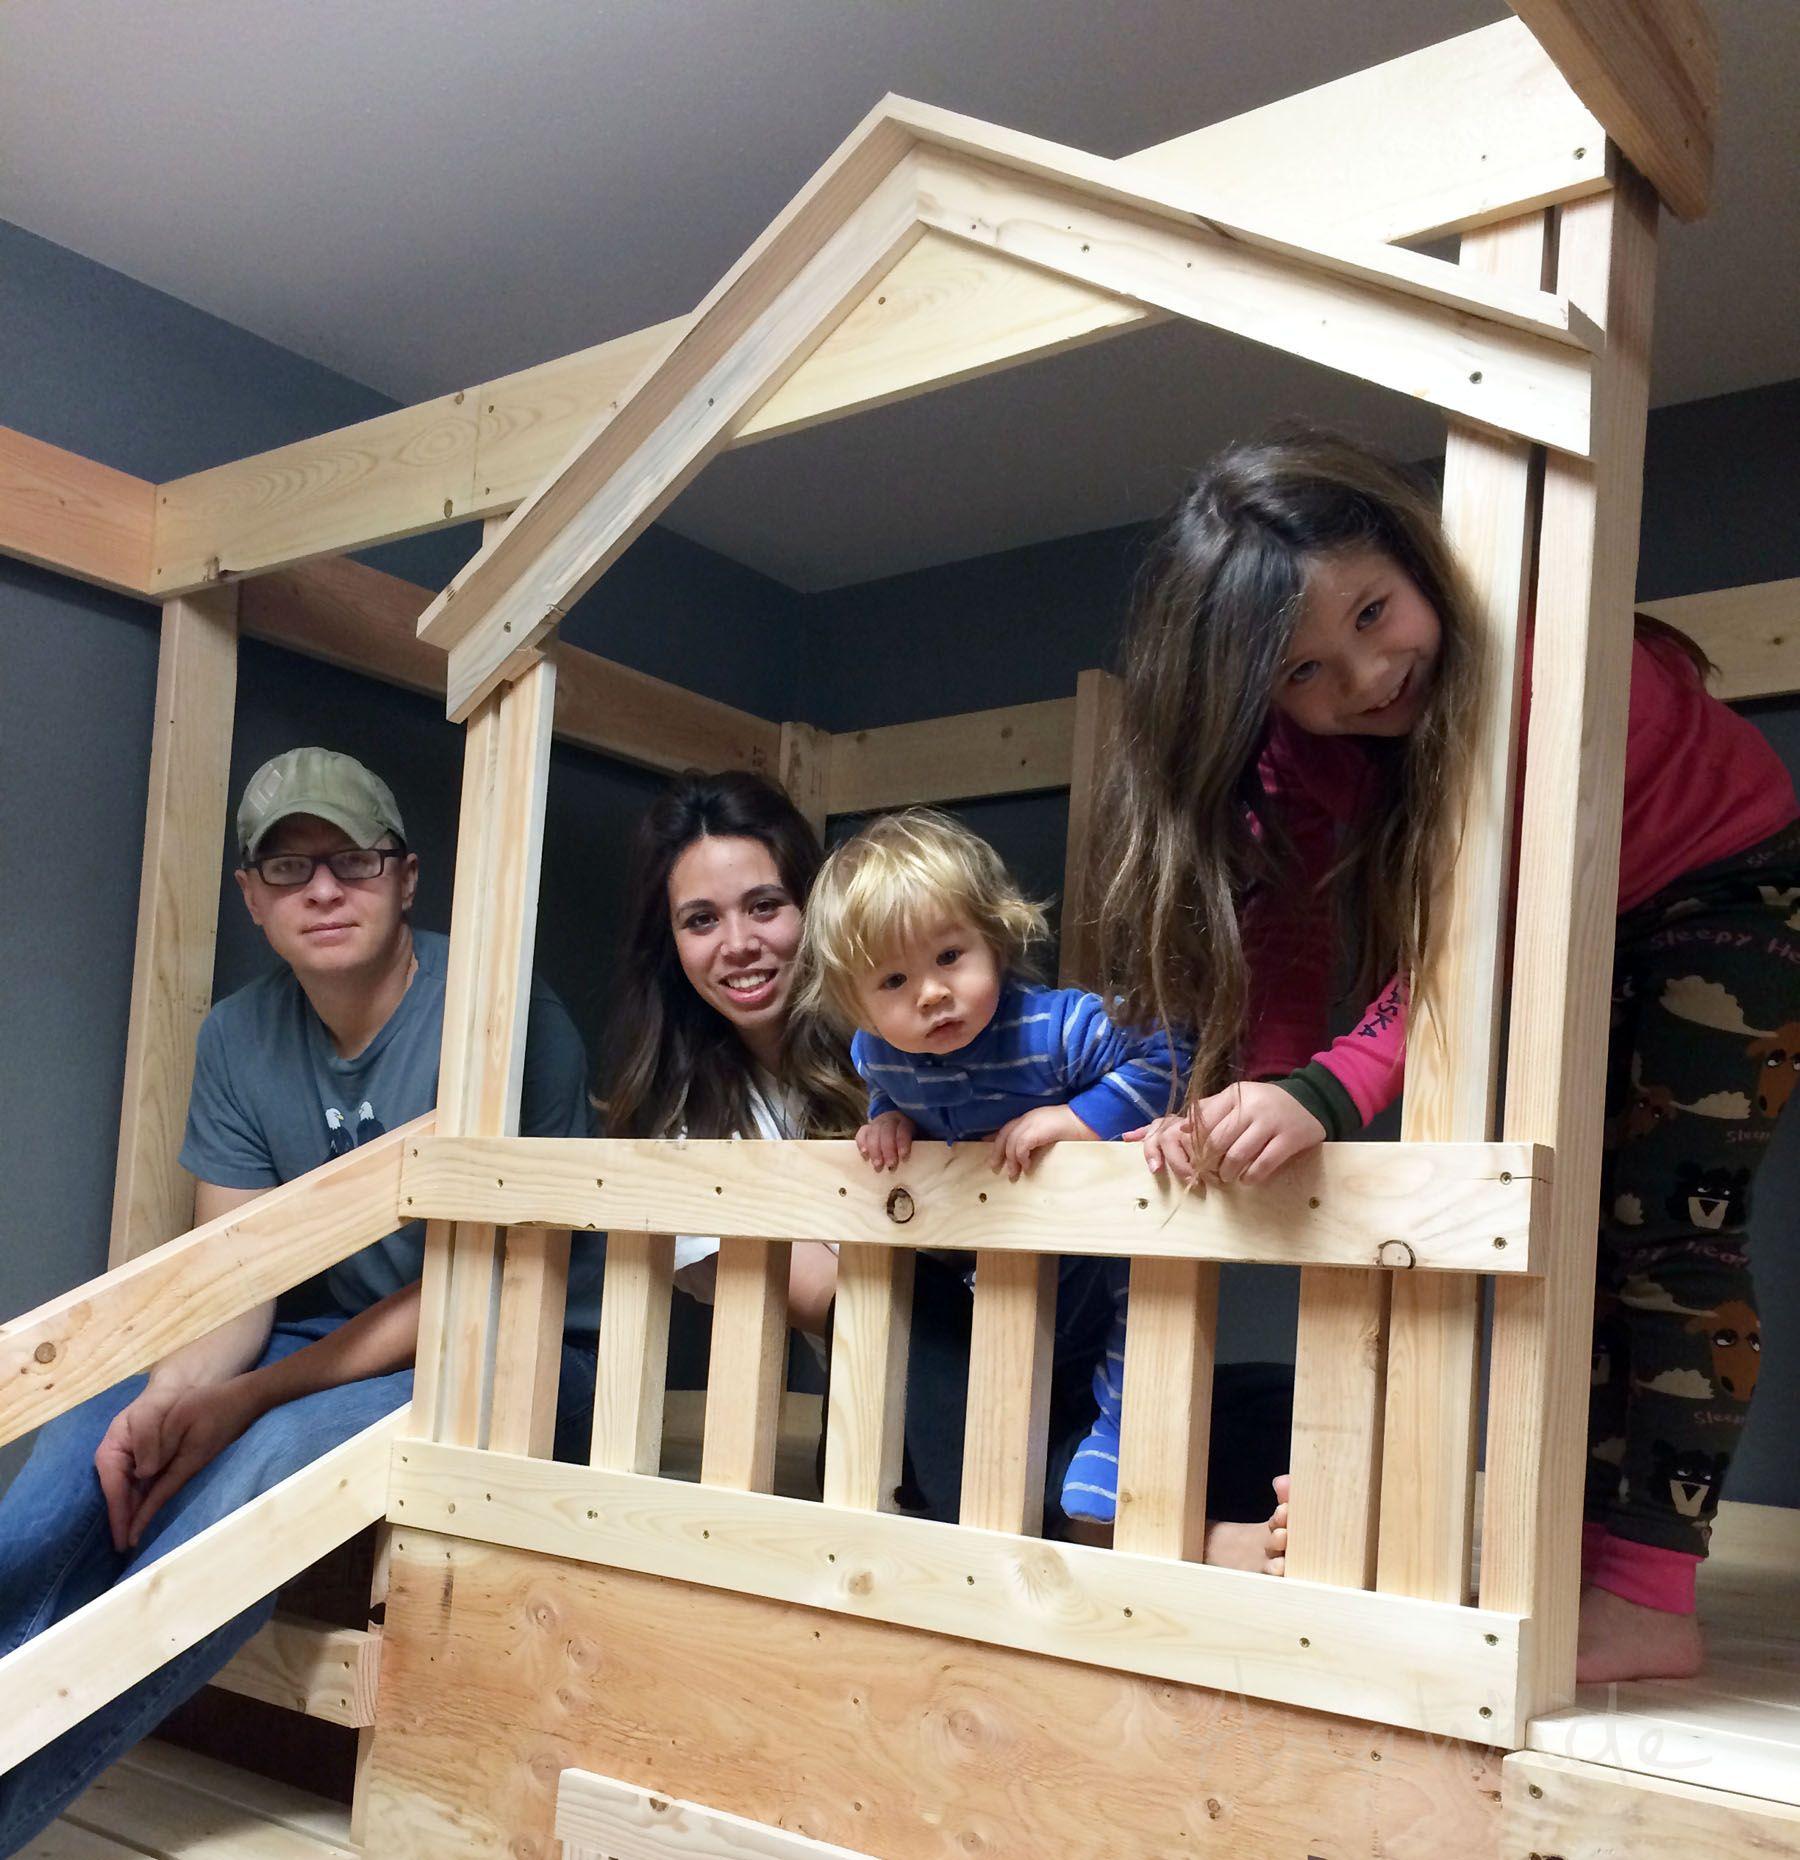 Diy basement indoor playground with monkey bars diy